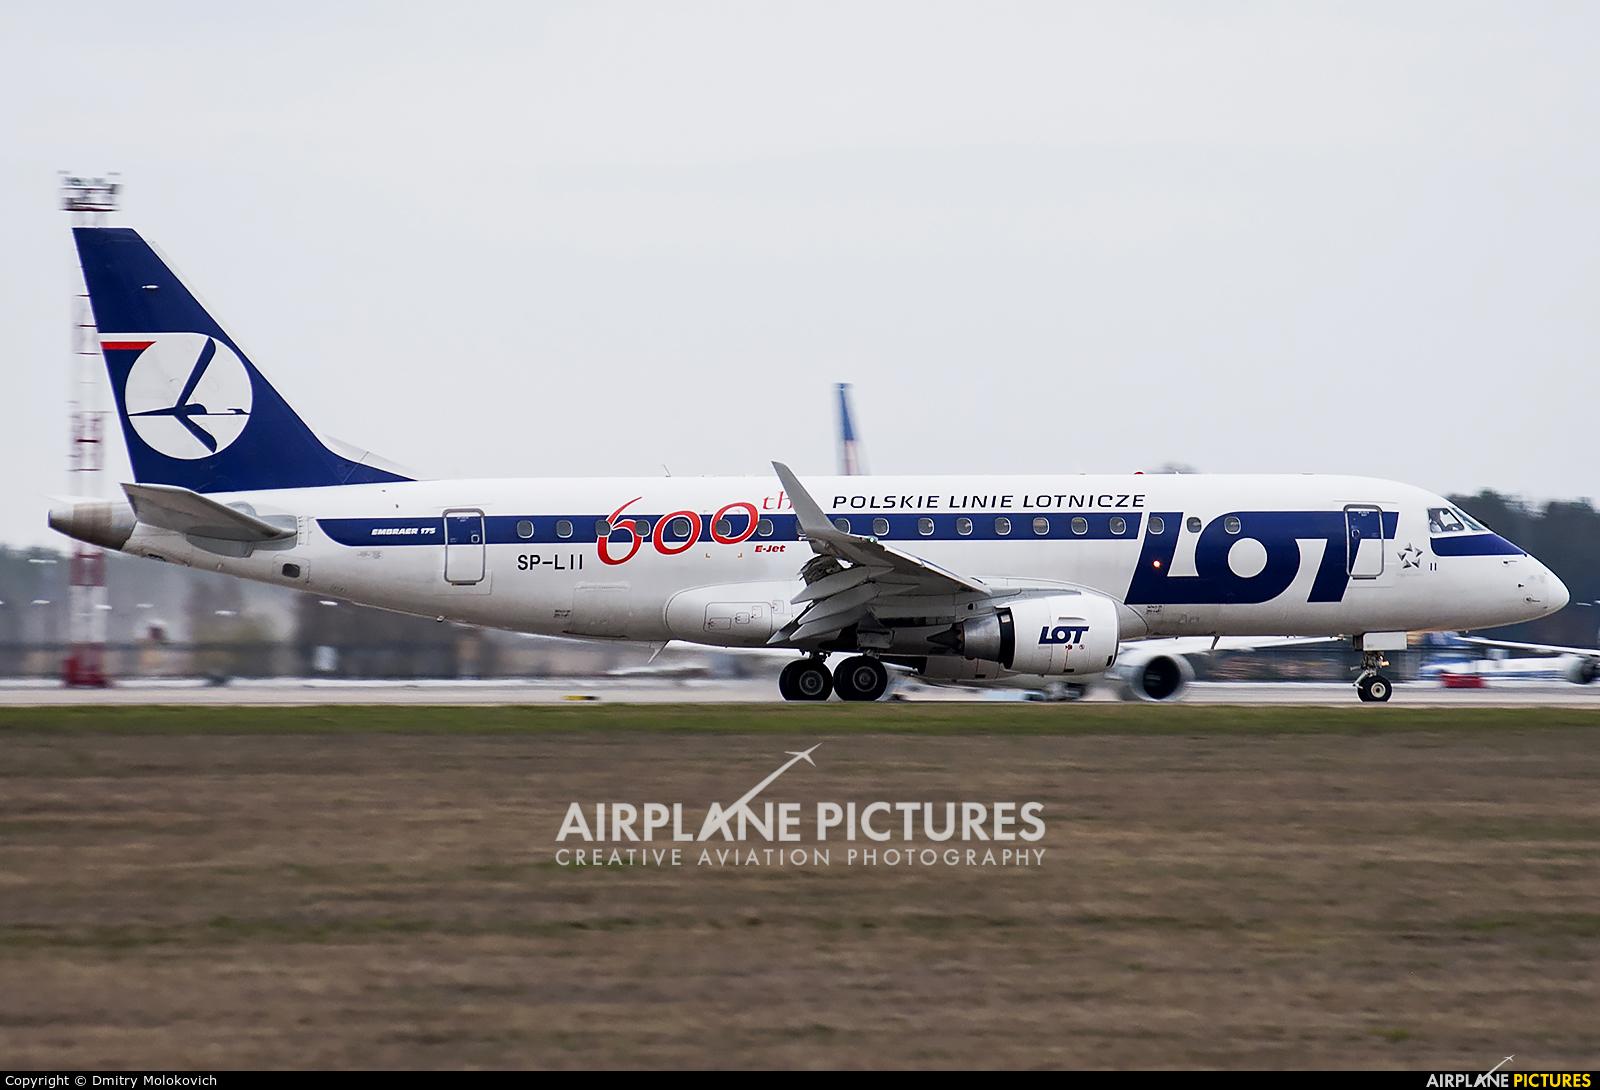 LOT - Polish Airlines SP-LII aircraft at Minsk Intl